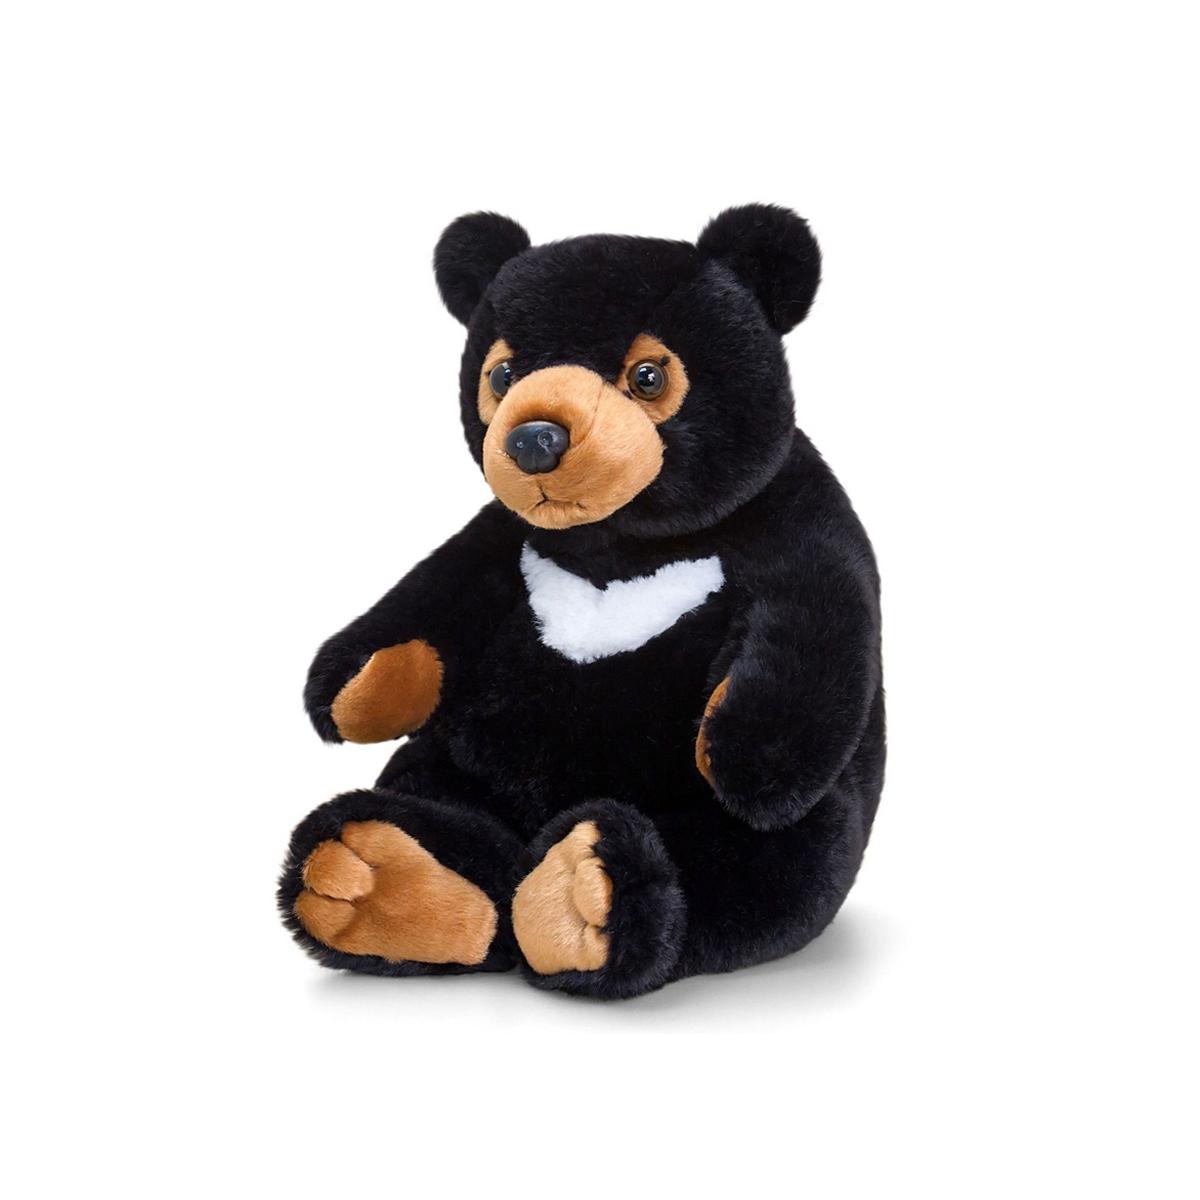 Sunbear Stuffed Animal, Keel Toys Wild Sun Bear Plush 25 Cm Superstore Ge Online Shop Of Super Chain Stores